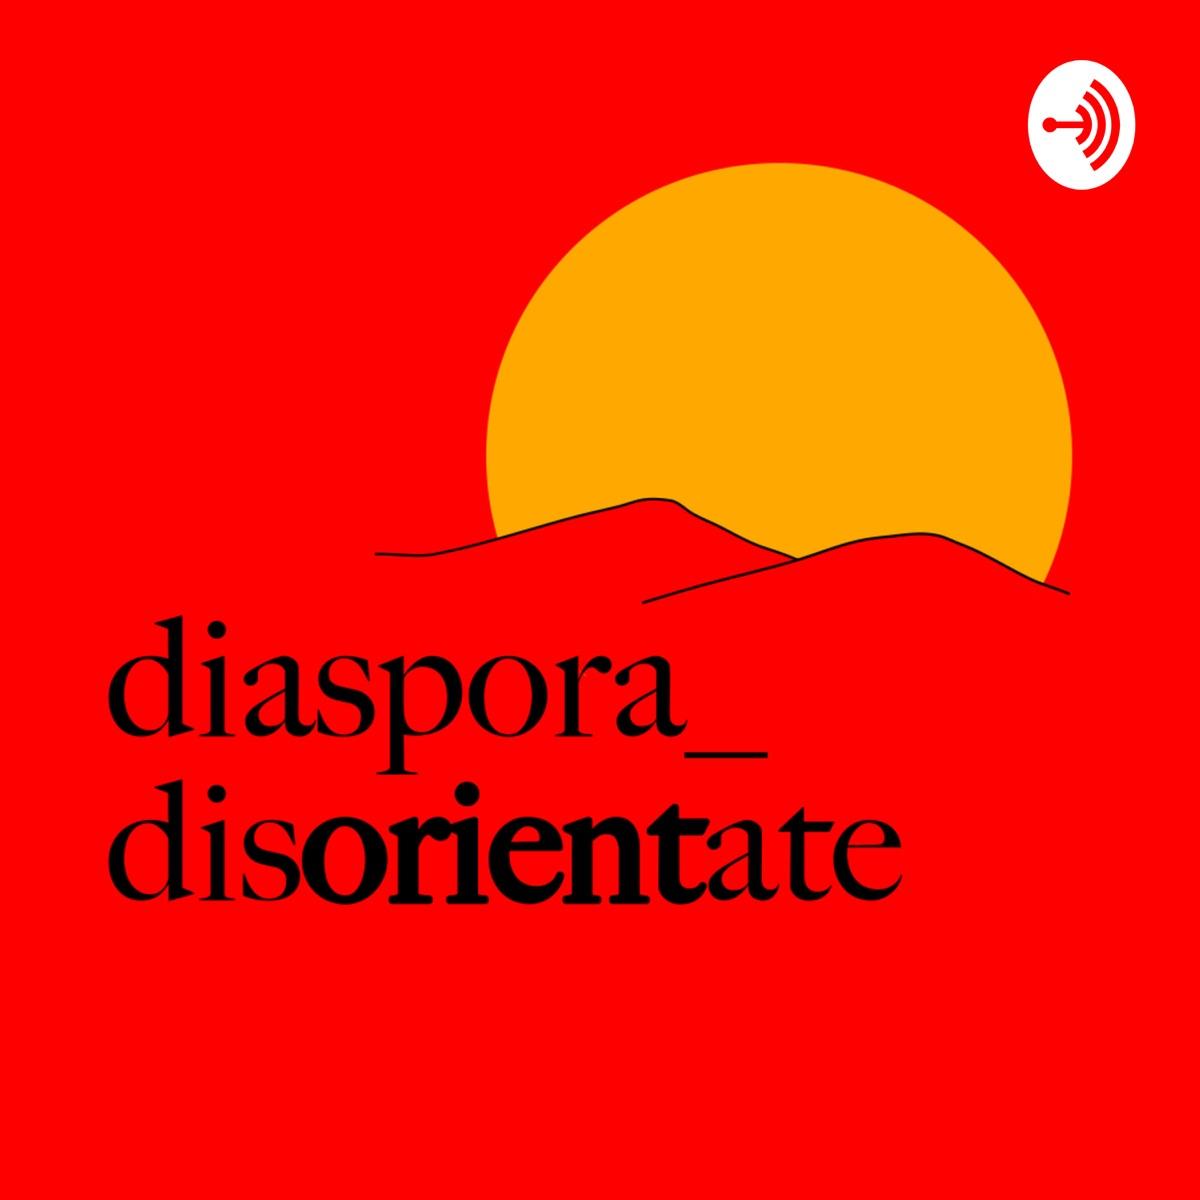 Diaspora Disorientate